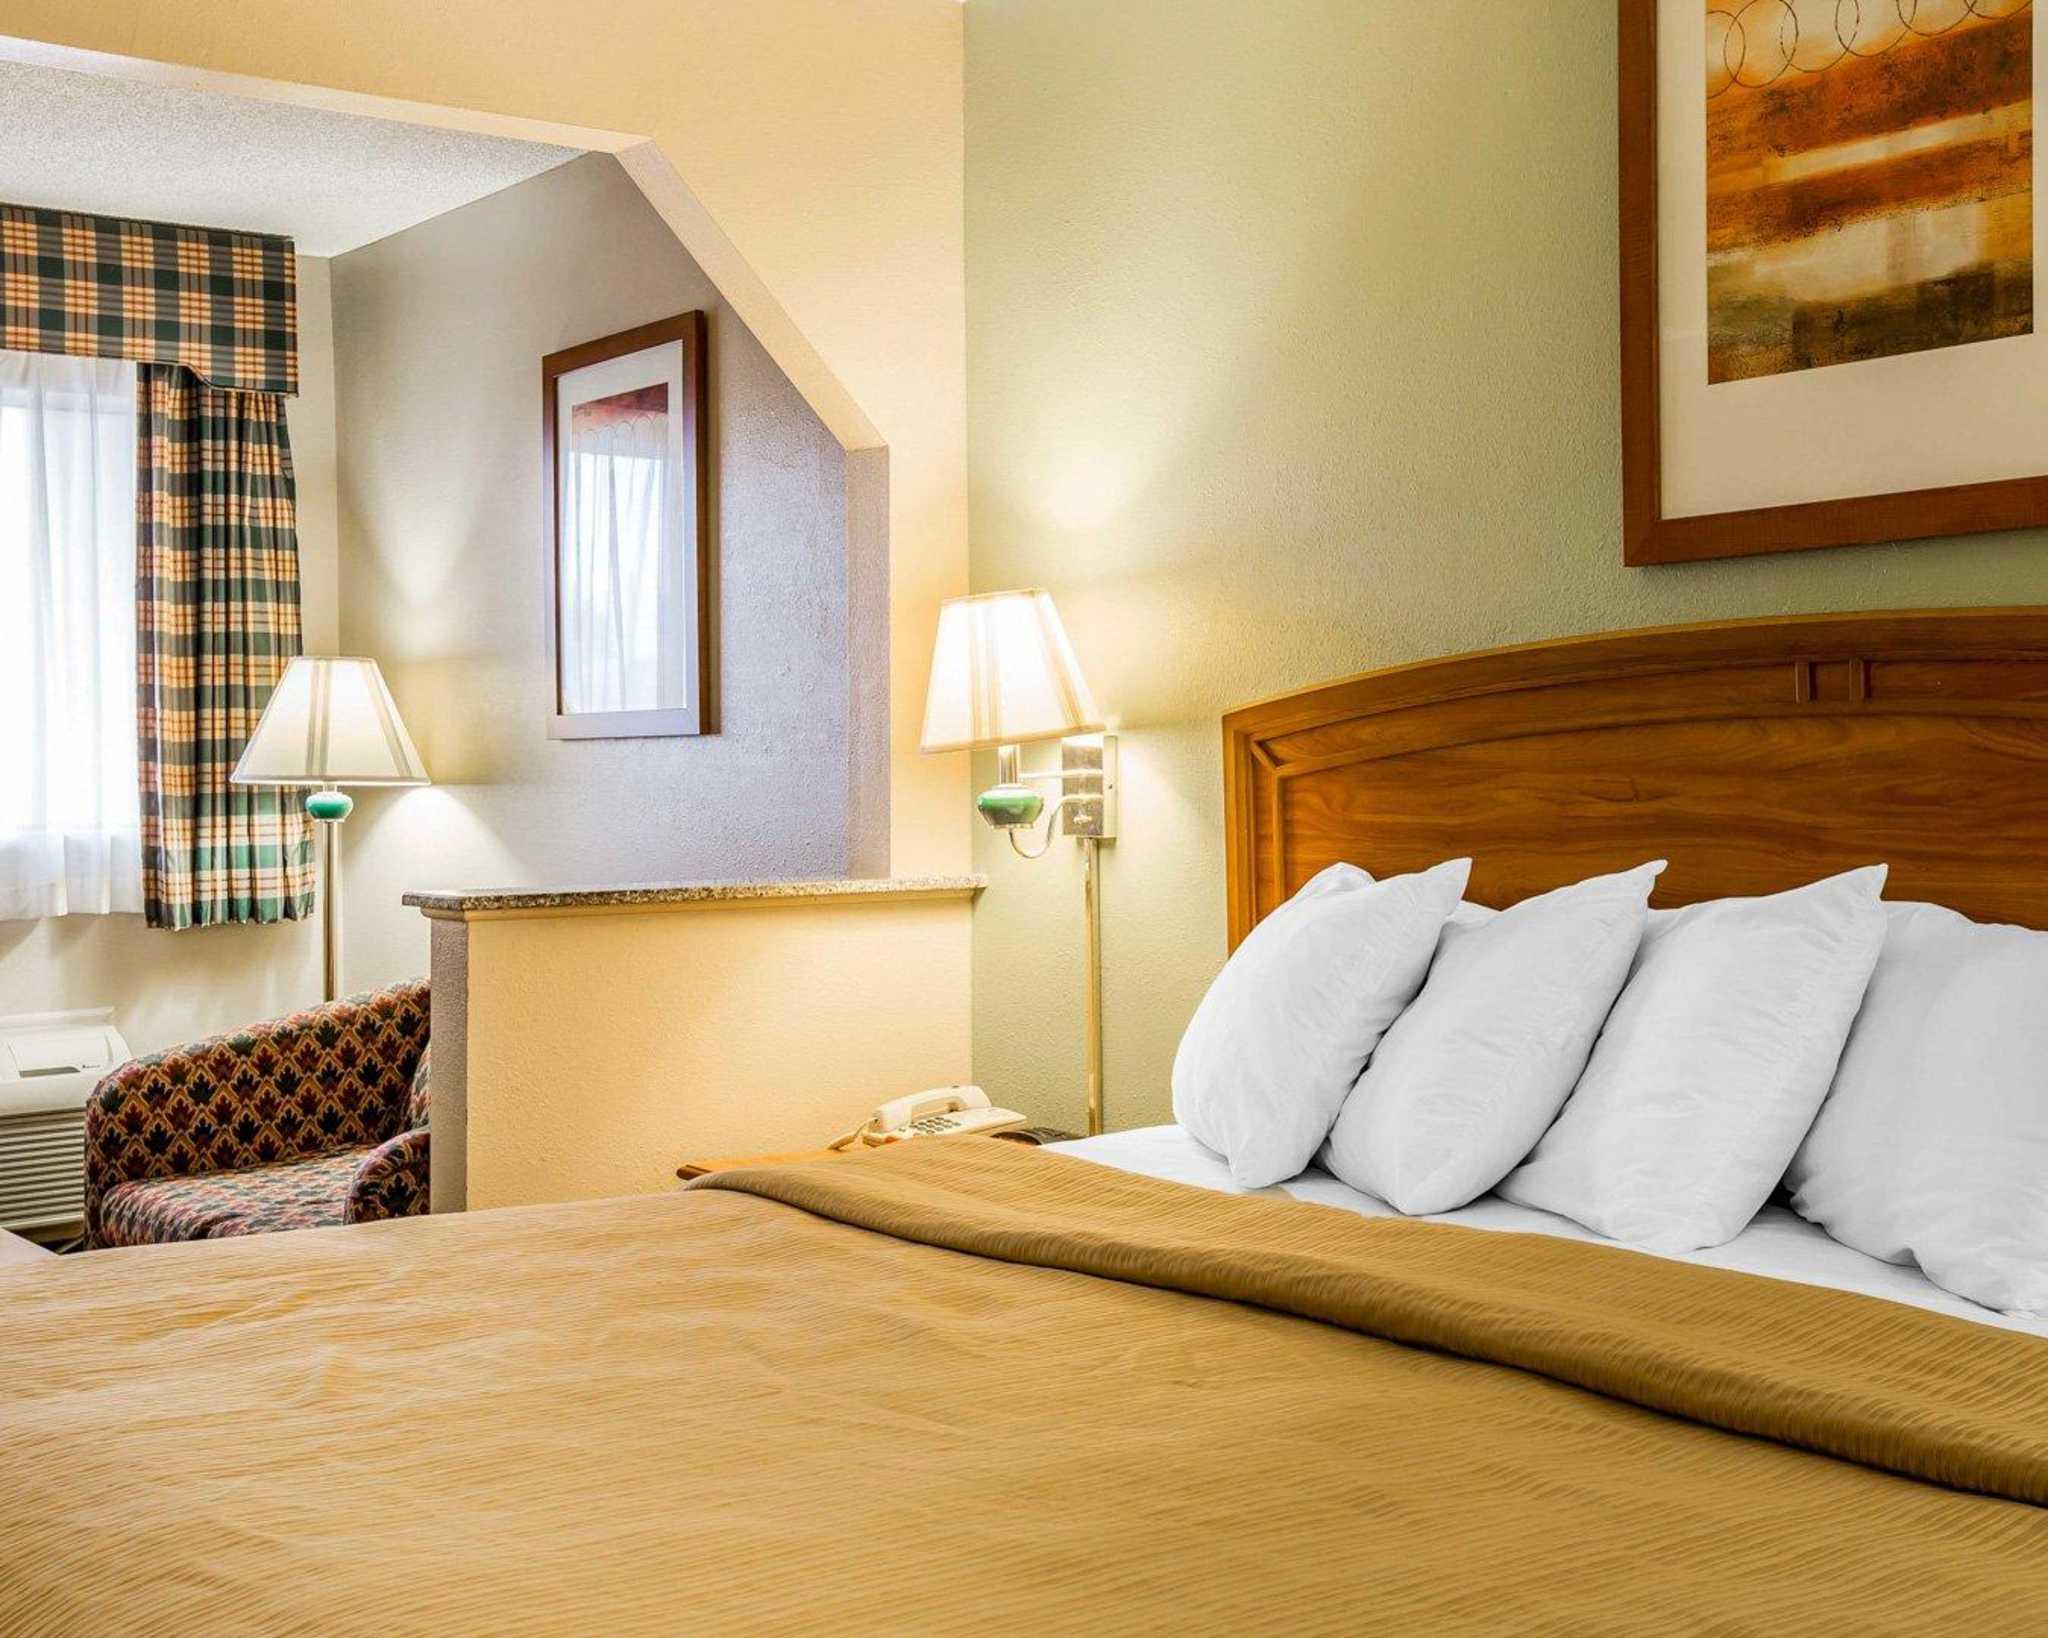 Quality Inn & Suites Dublin image 5